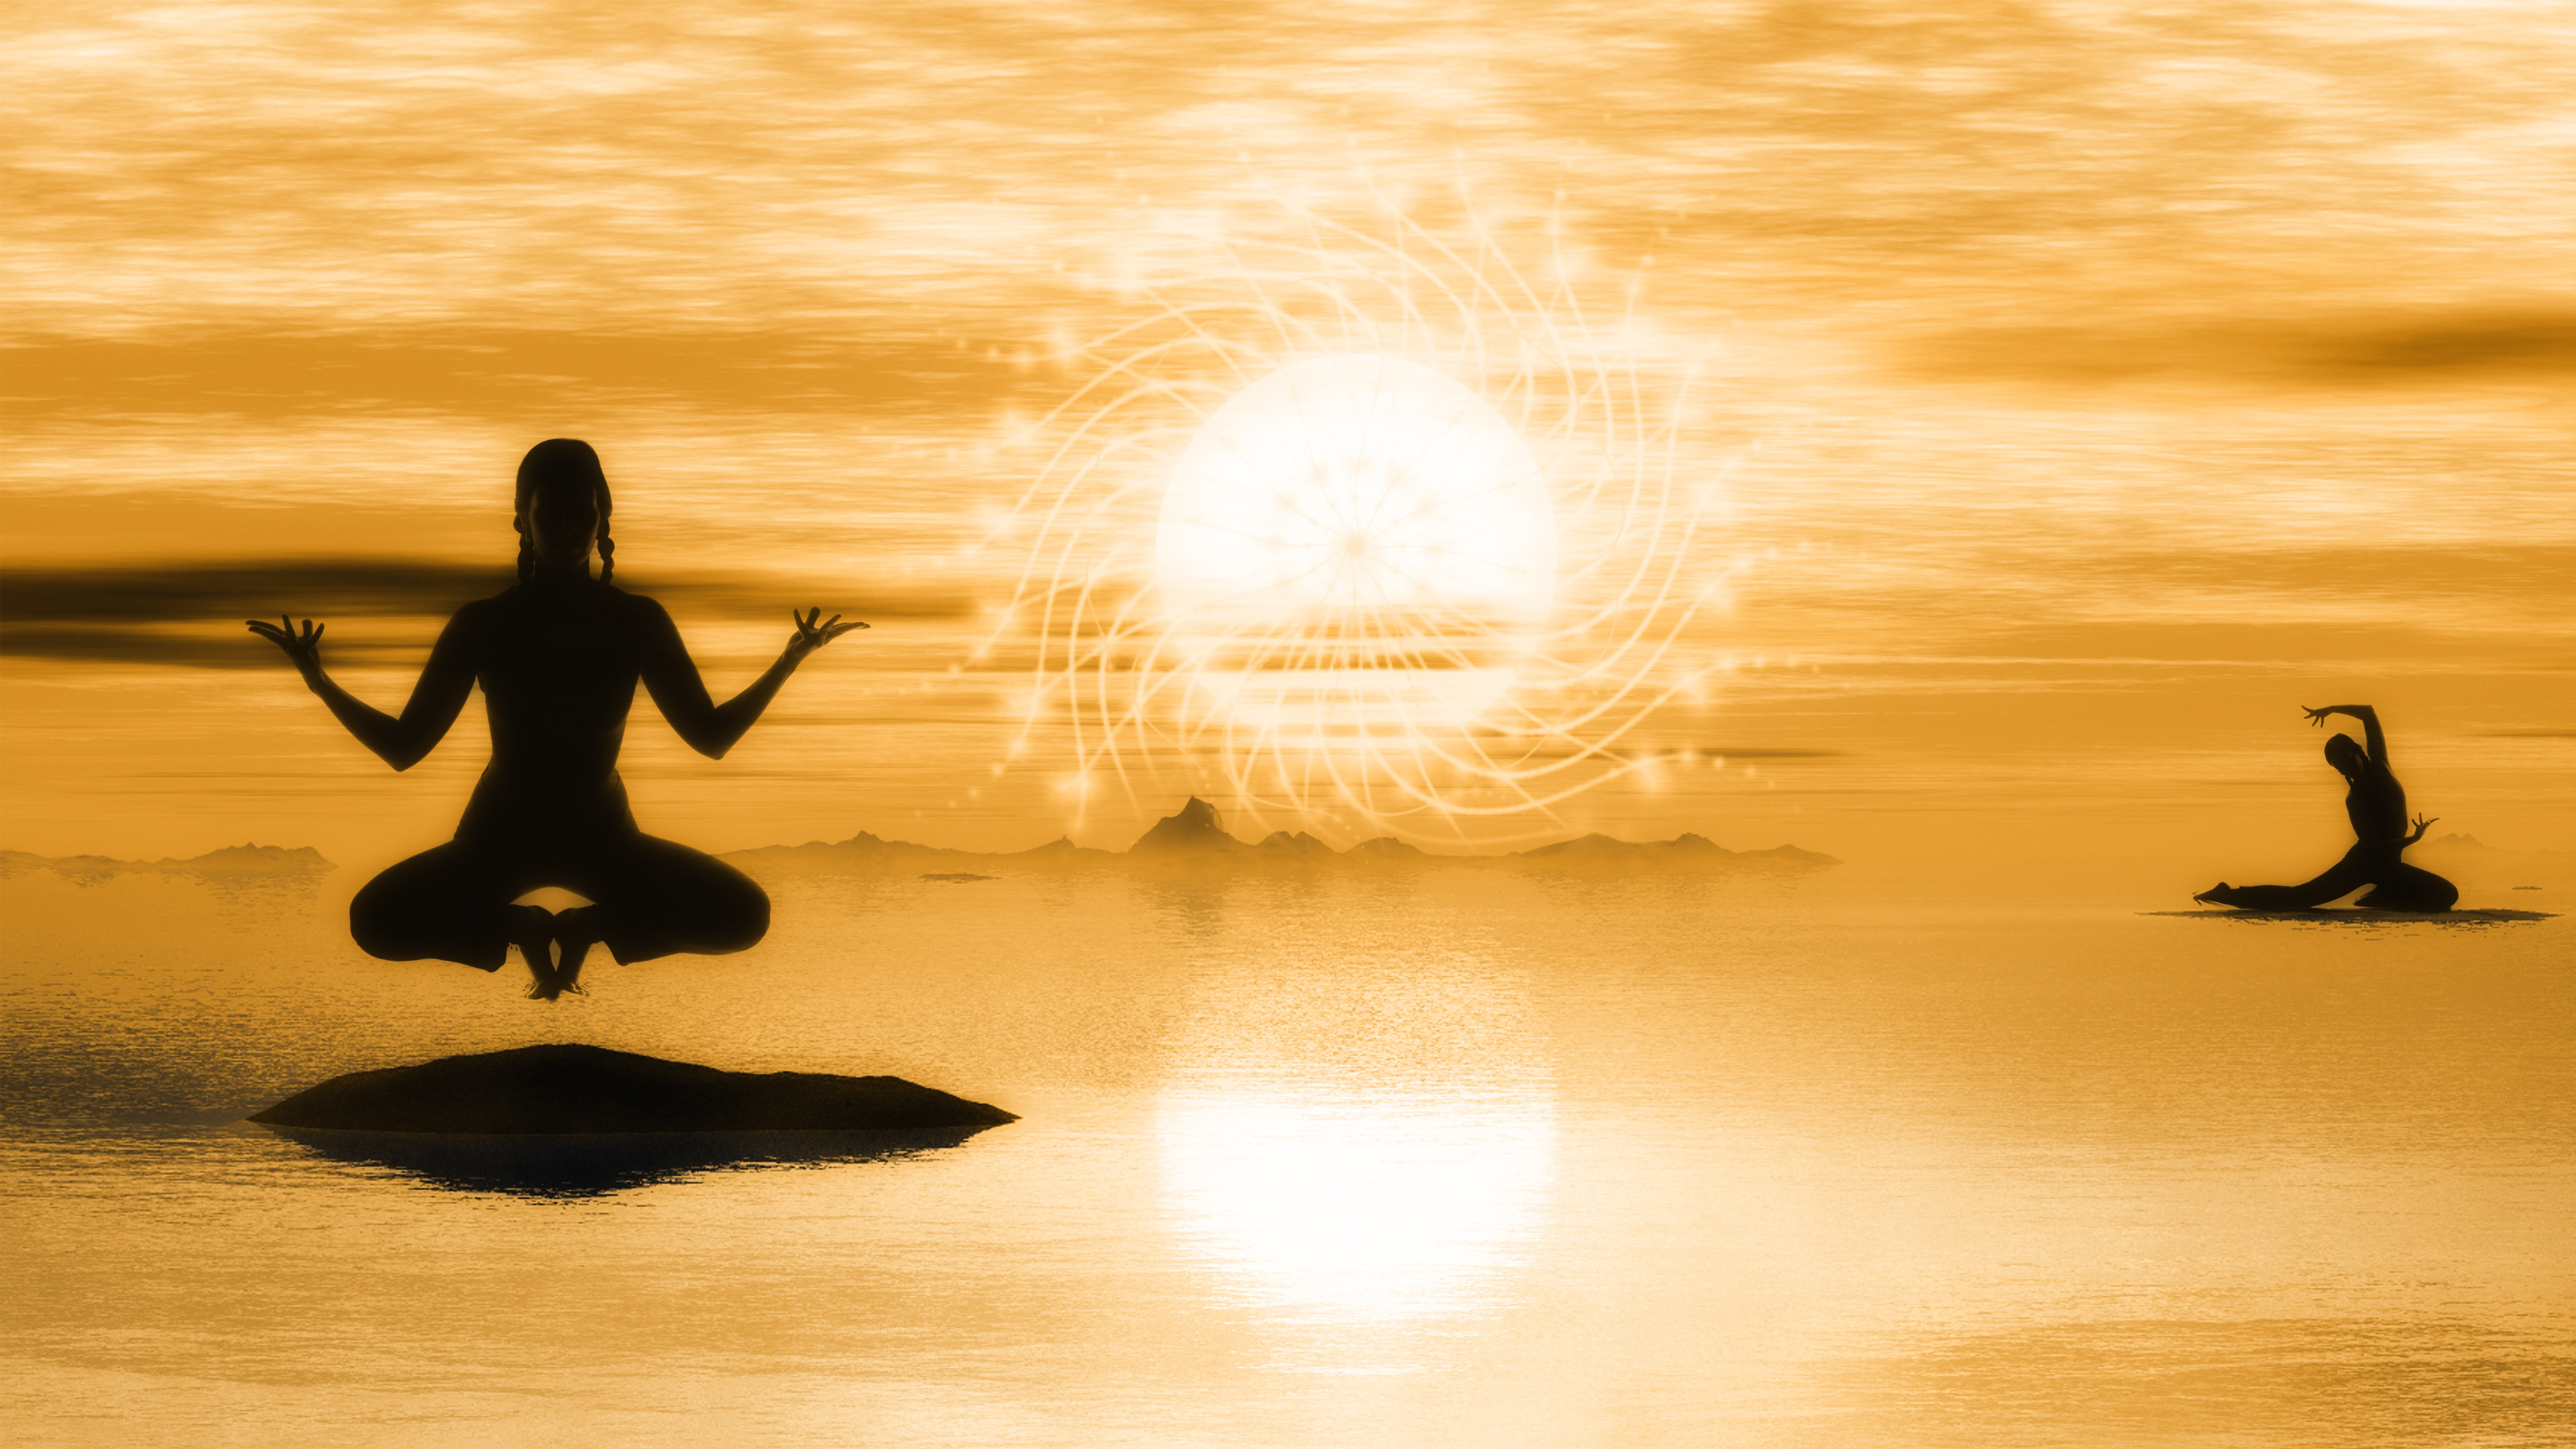 Meditation7330917386 - Meditation - Meditation, Hope